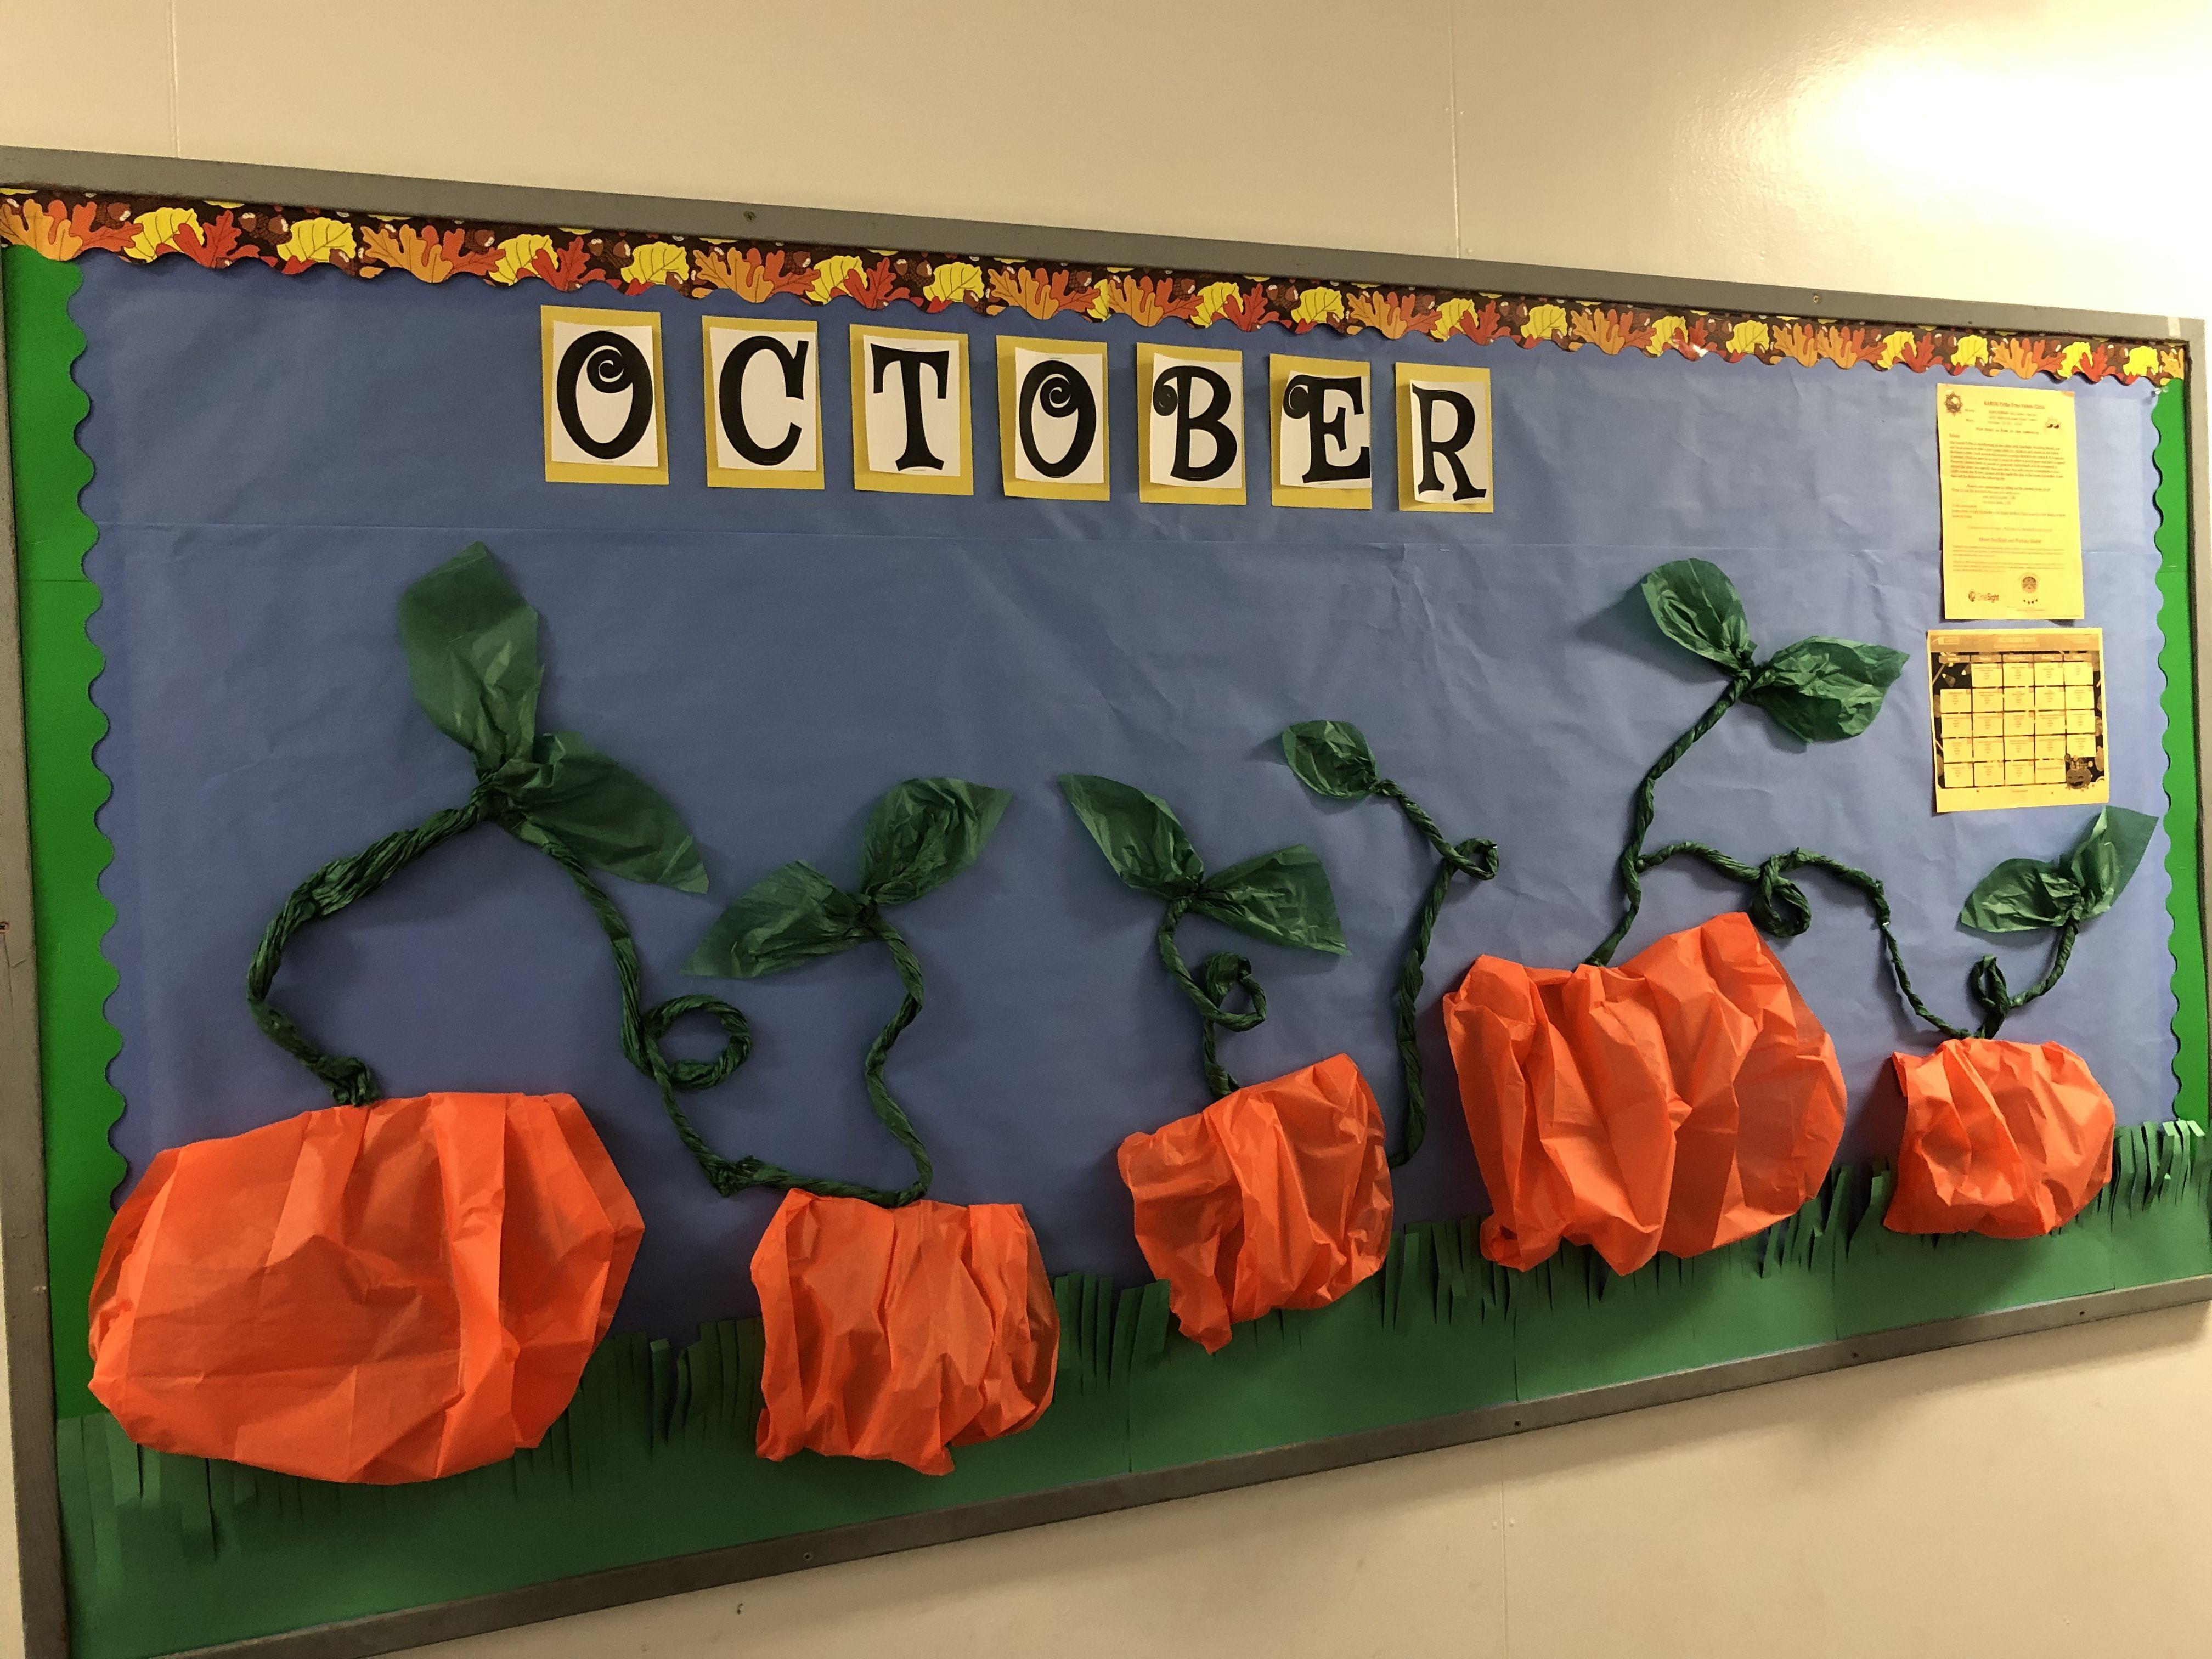 Fall Bulletin Board Theme #pumpkinpatchbulletinboard Pumpkin Patch, October #pumpkinpatchbulletinboard